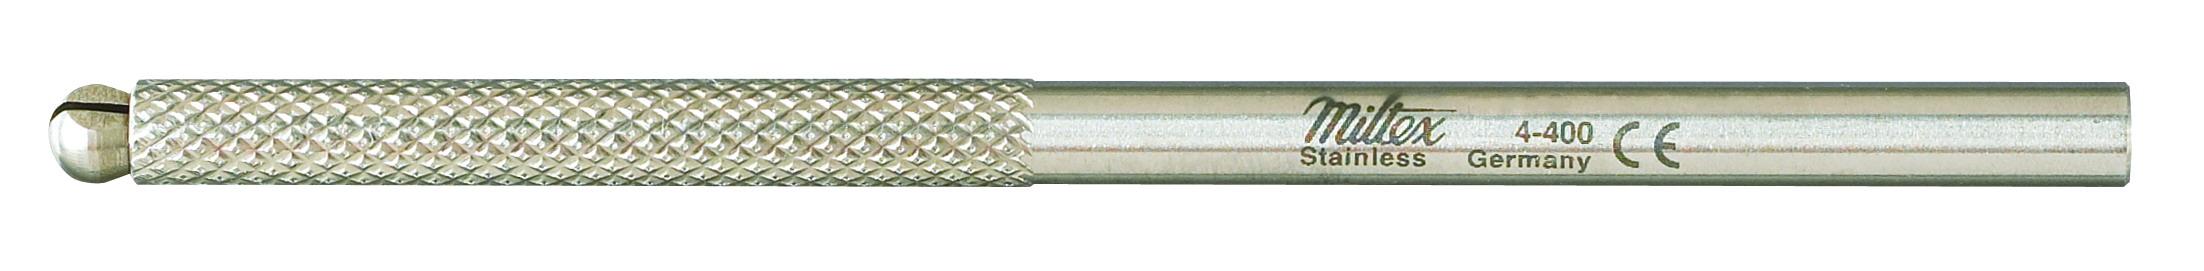 miniature-blade-handle-with-chuck-3-3-4-95-cm-round-knurld-3k-type-4-400-miltex.jpg